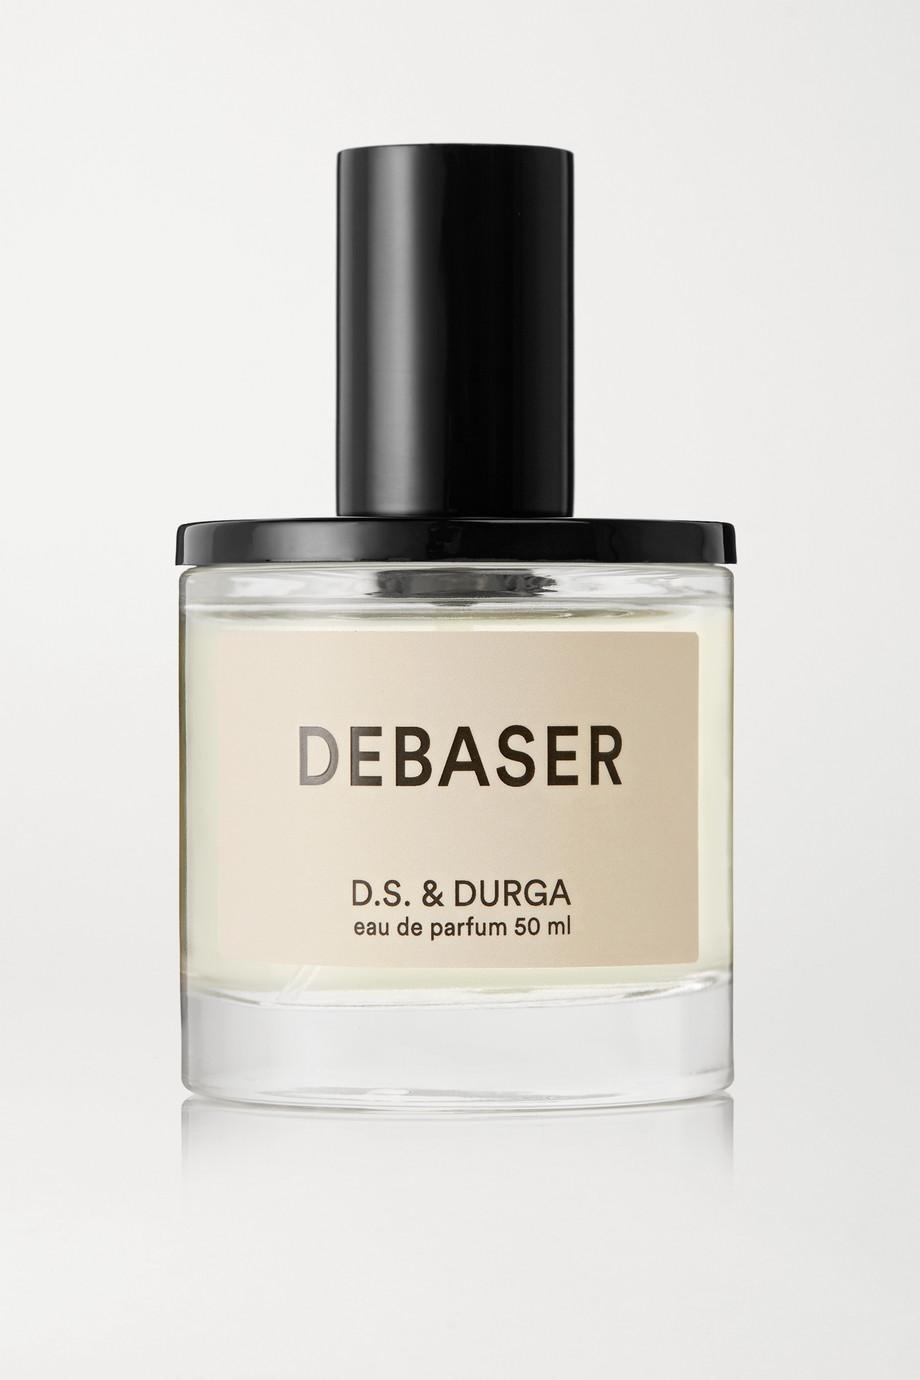 D.S. & Durga Eau de Parfum - Debaser, 50ml